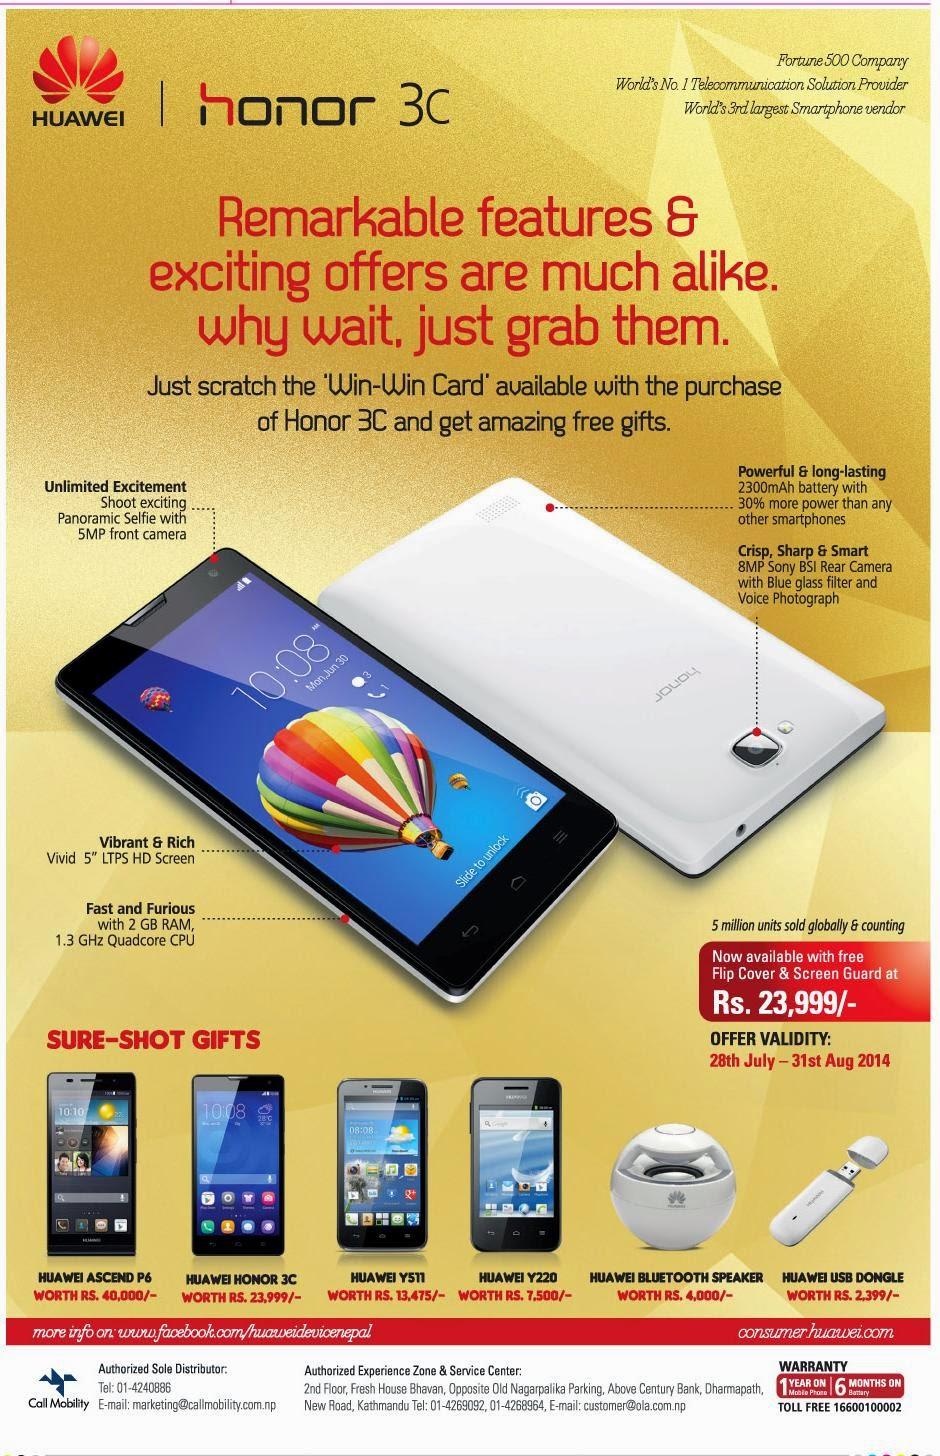 Huawei Smartphone price in Nepal - Update Aug20, 2014 | Nepali